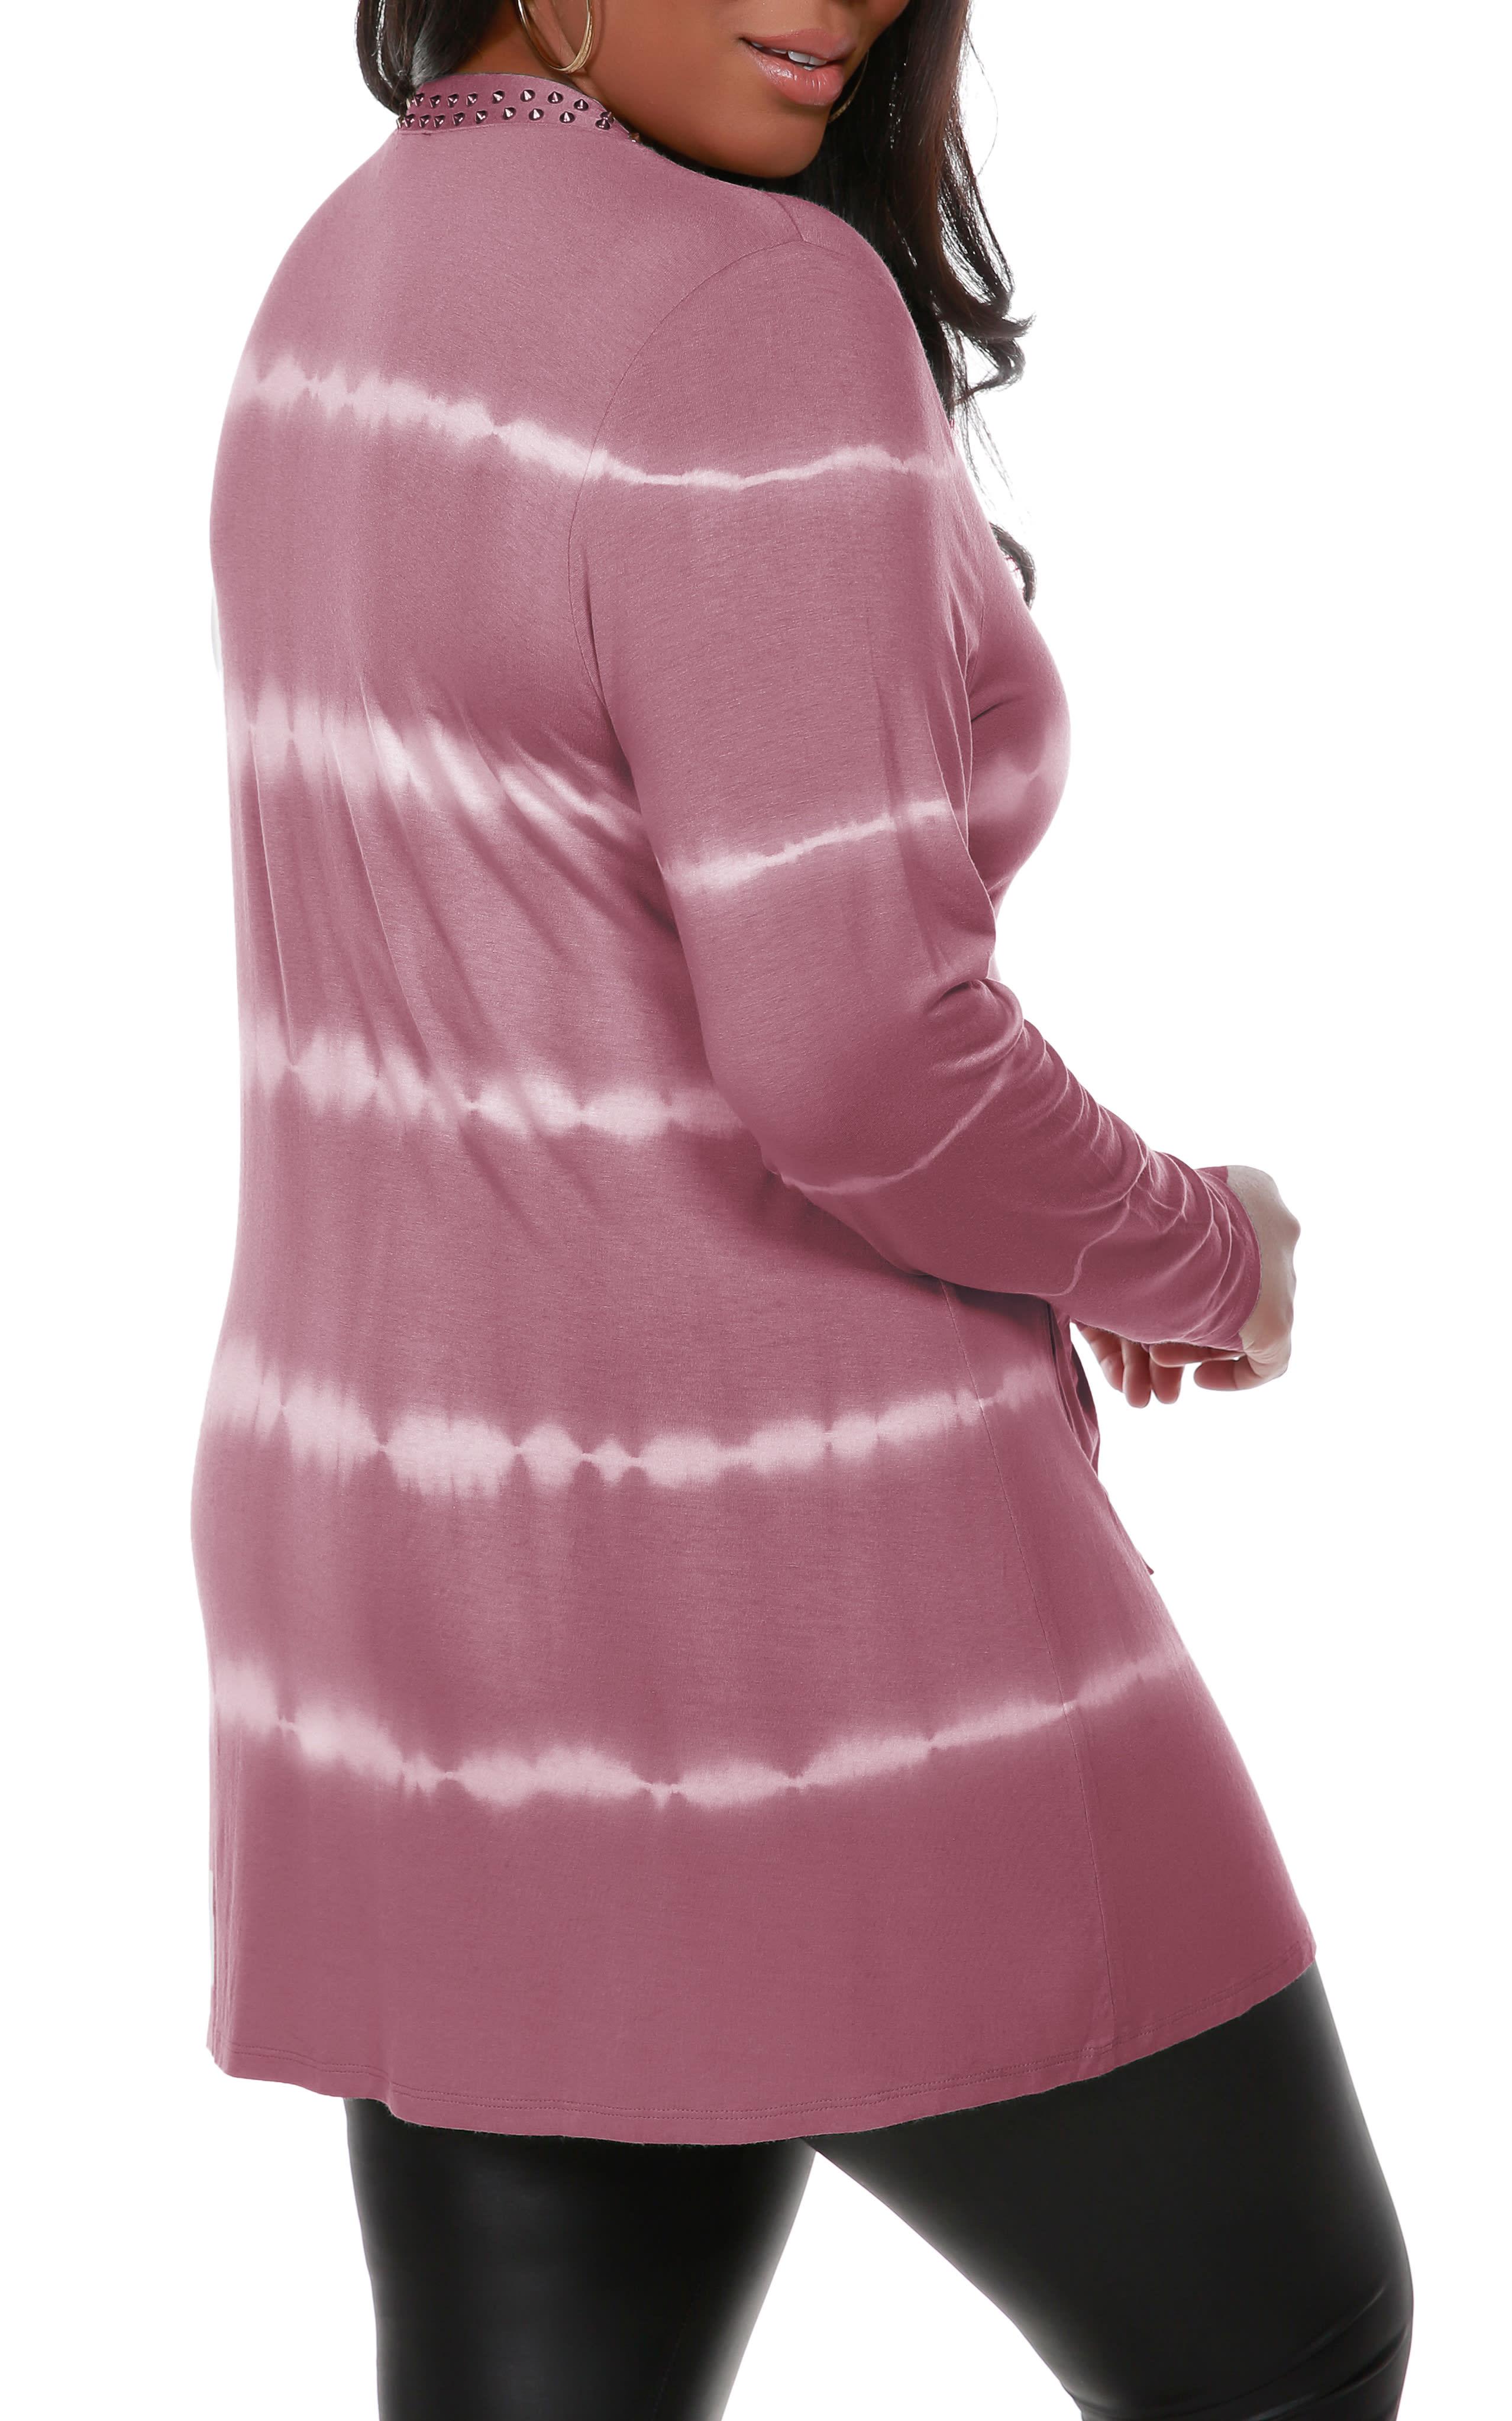 Tie Dye Cardigan - Velvet Mauve/Silver - Back